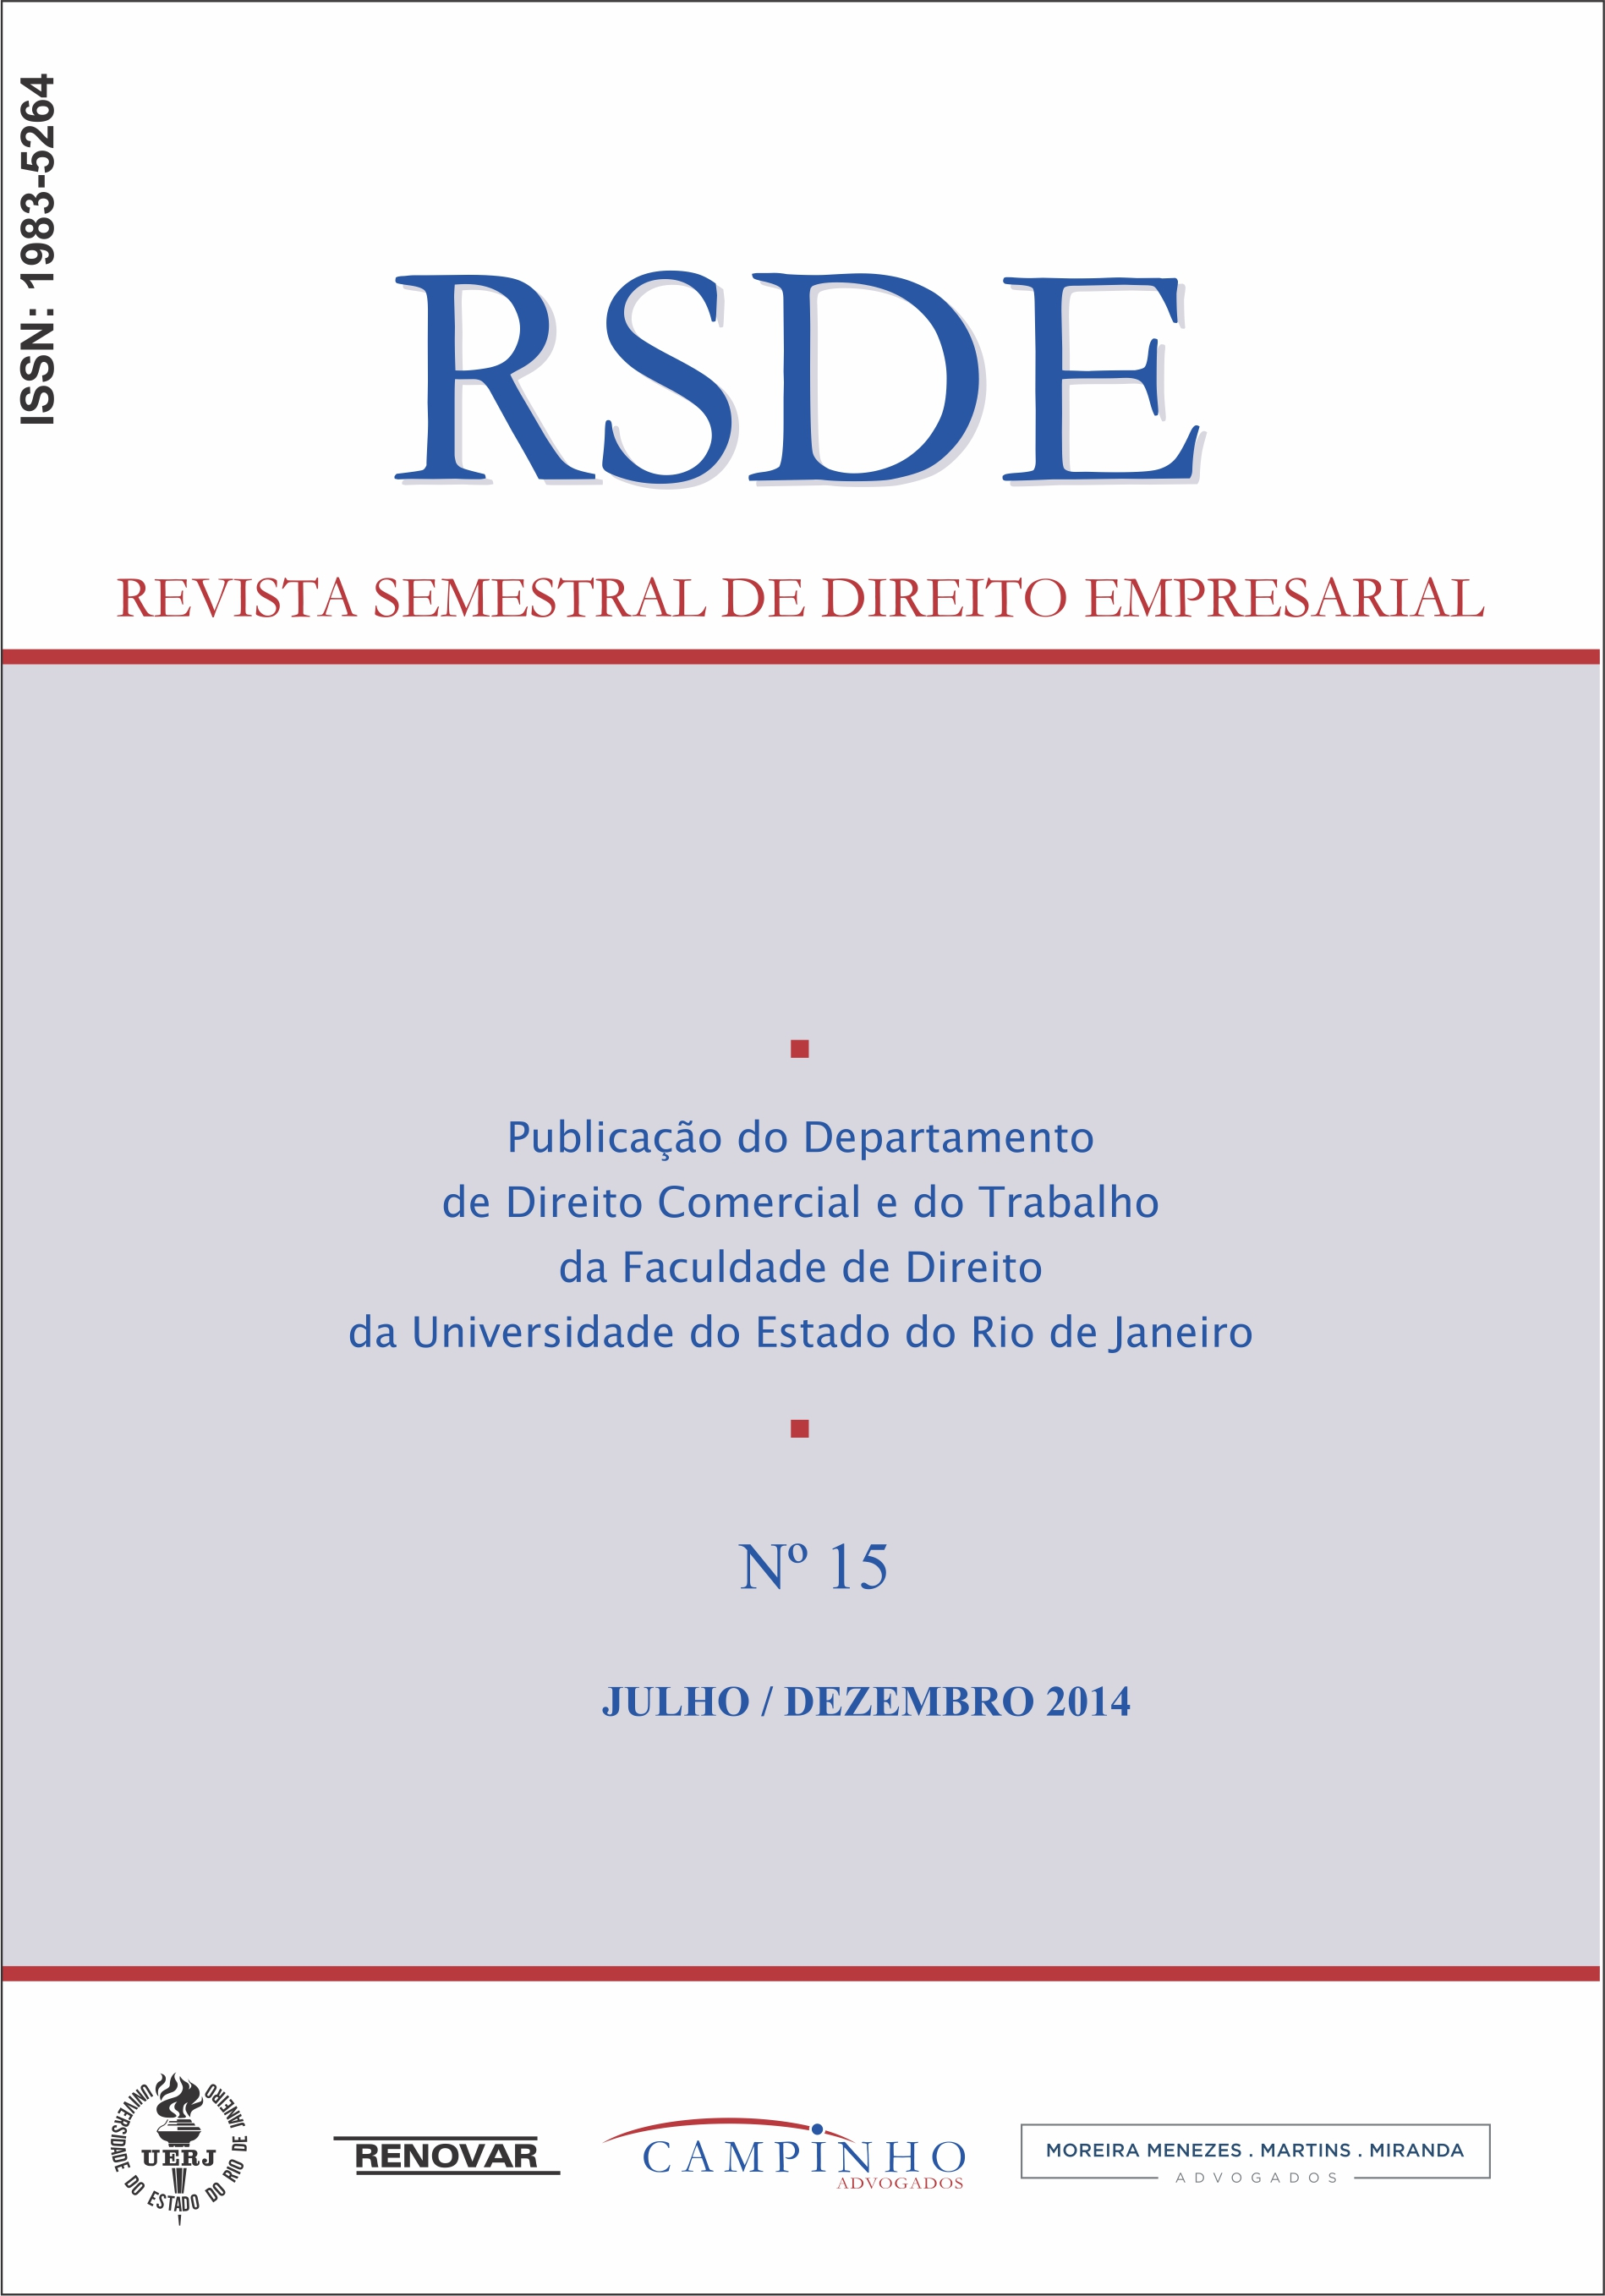 Capa_-_rsde_15